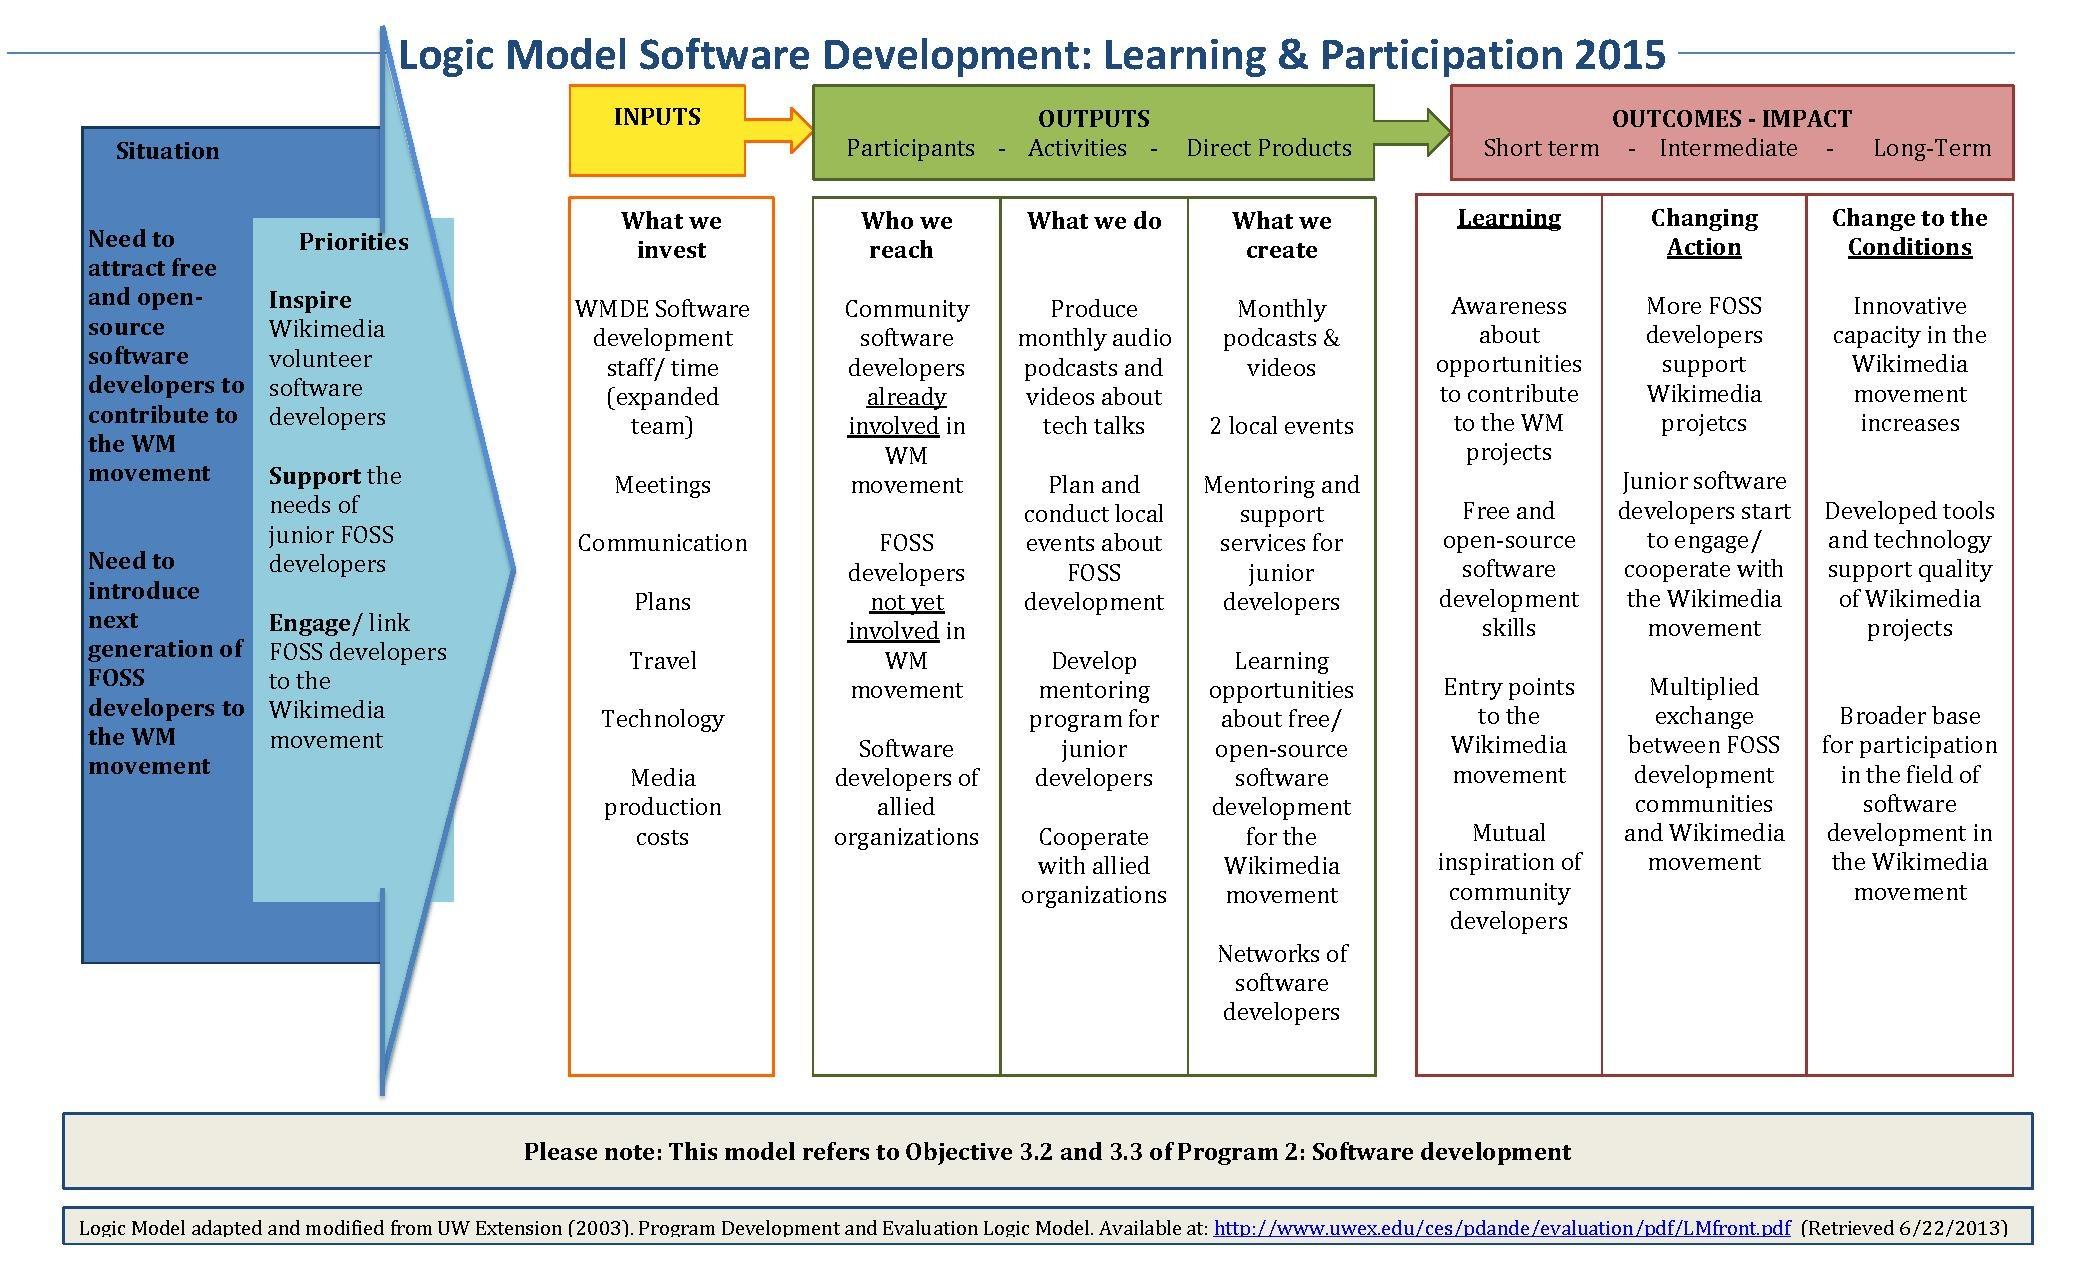 File Logic Model Software Development Partcipation Final